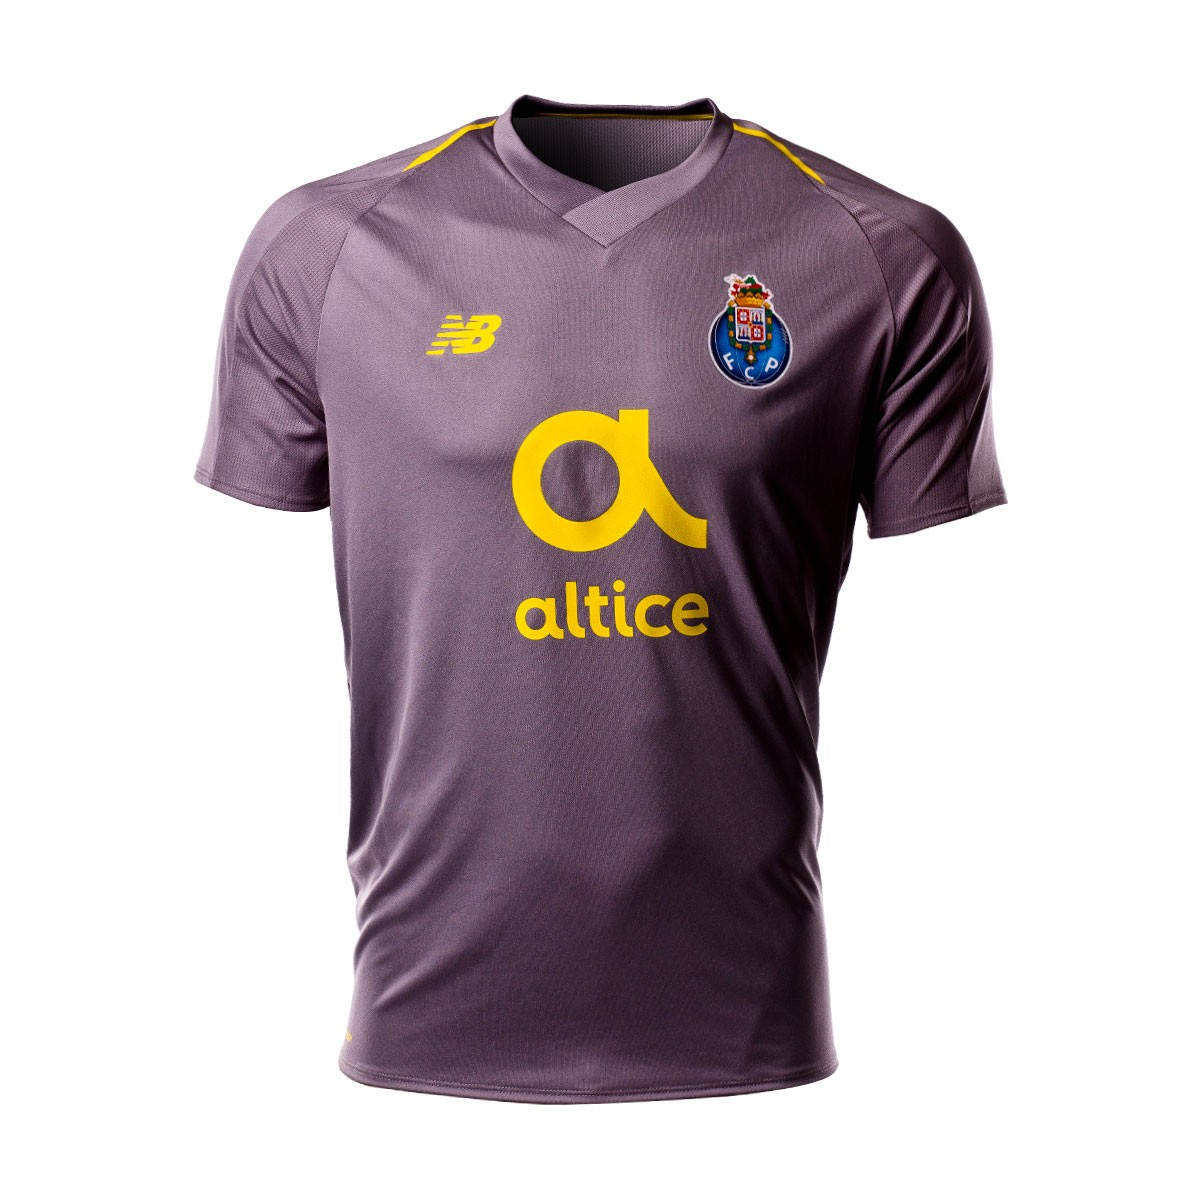 100% authentic 7bf3c bd023 Camiseta FC Porto Segunda Equipación 2018-2019 Niño Gris